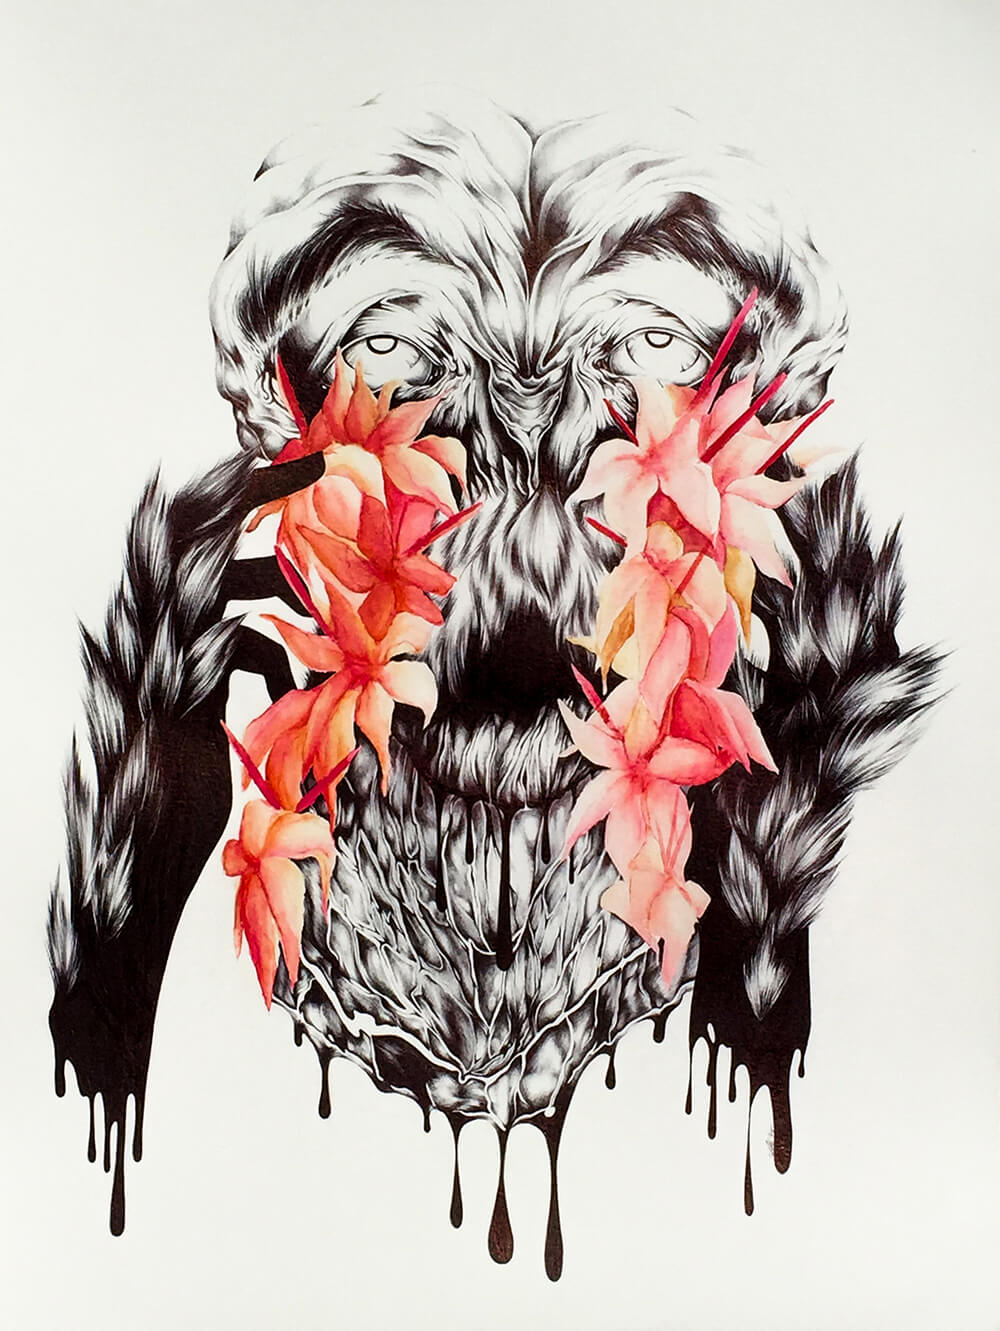 Creature #1    Medium: Black Ballpoint Pen, Watercolor, and Colored Pencil